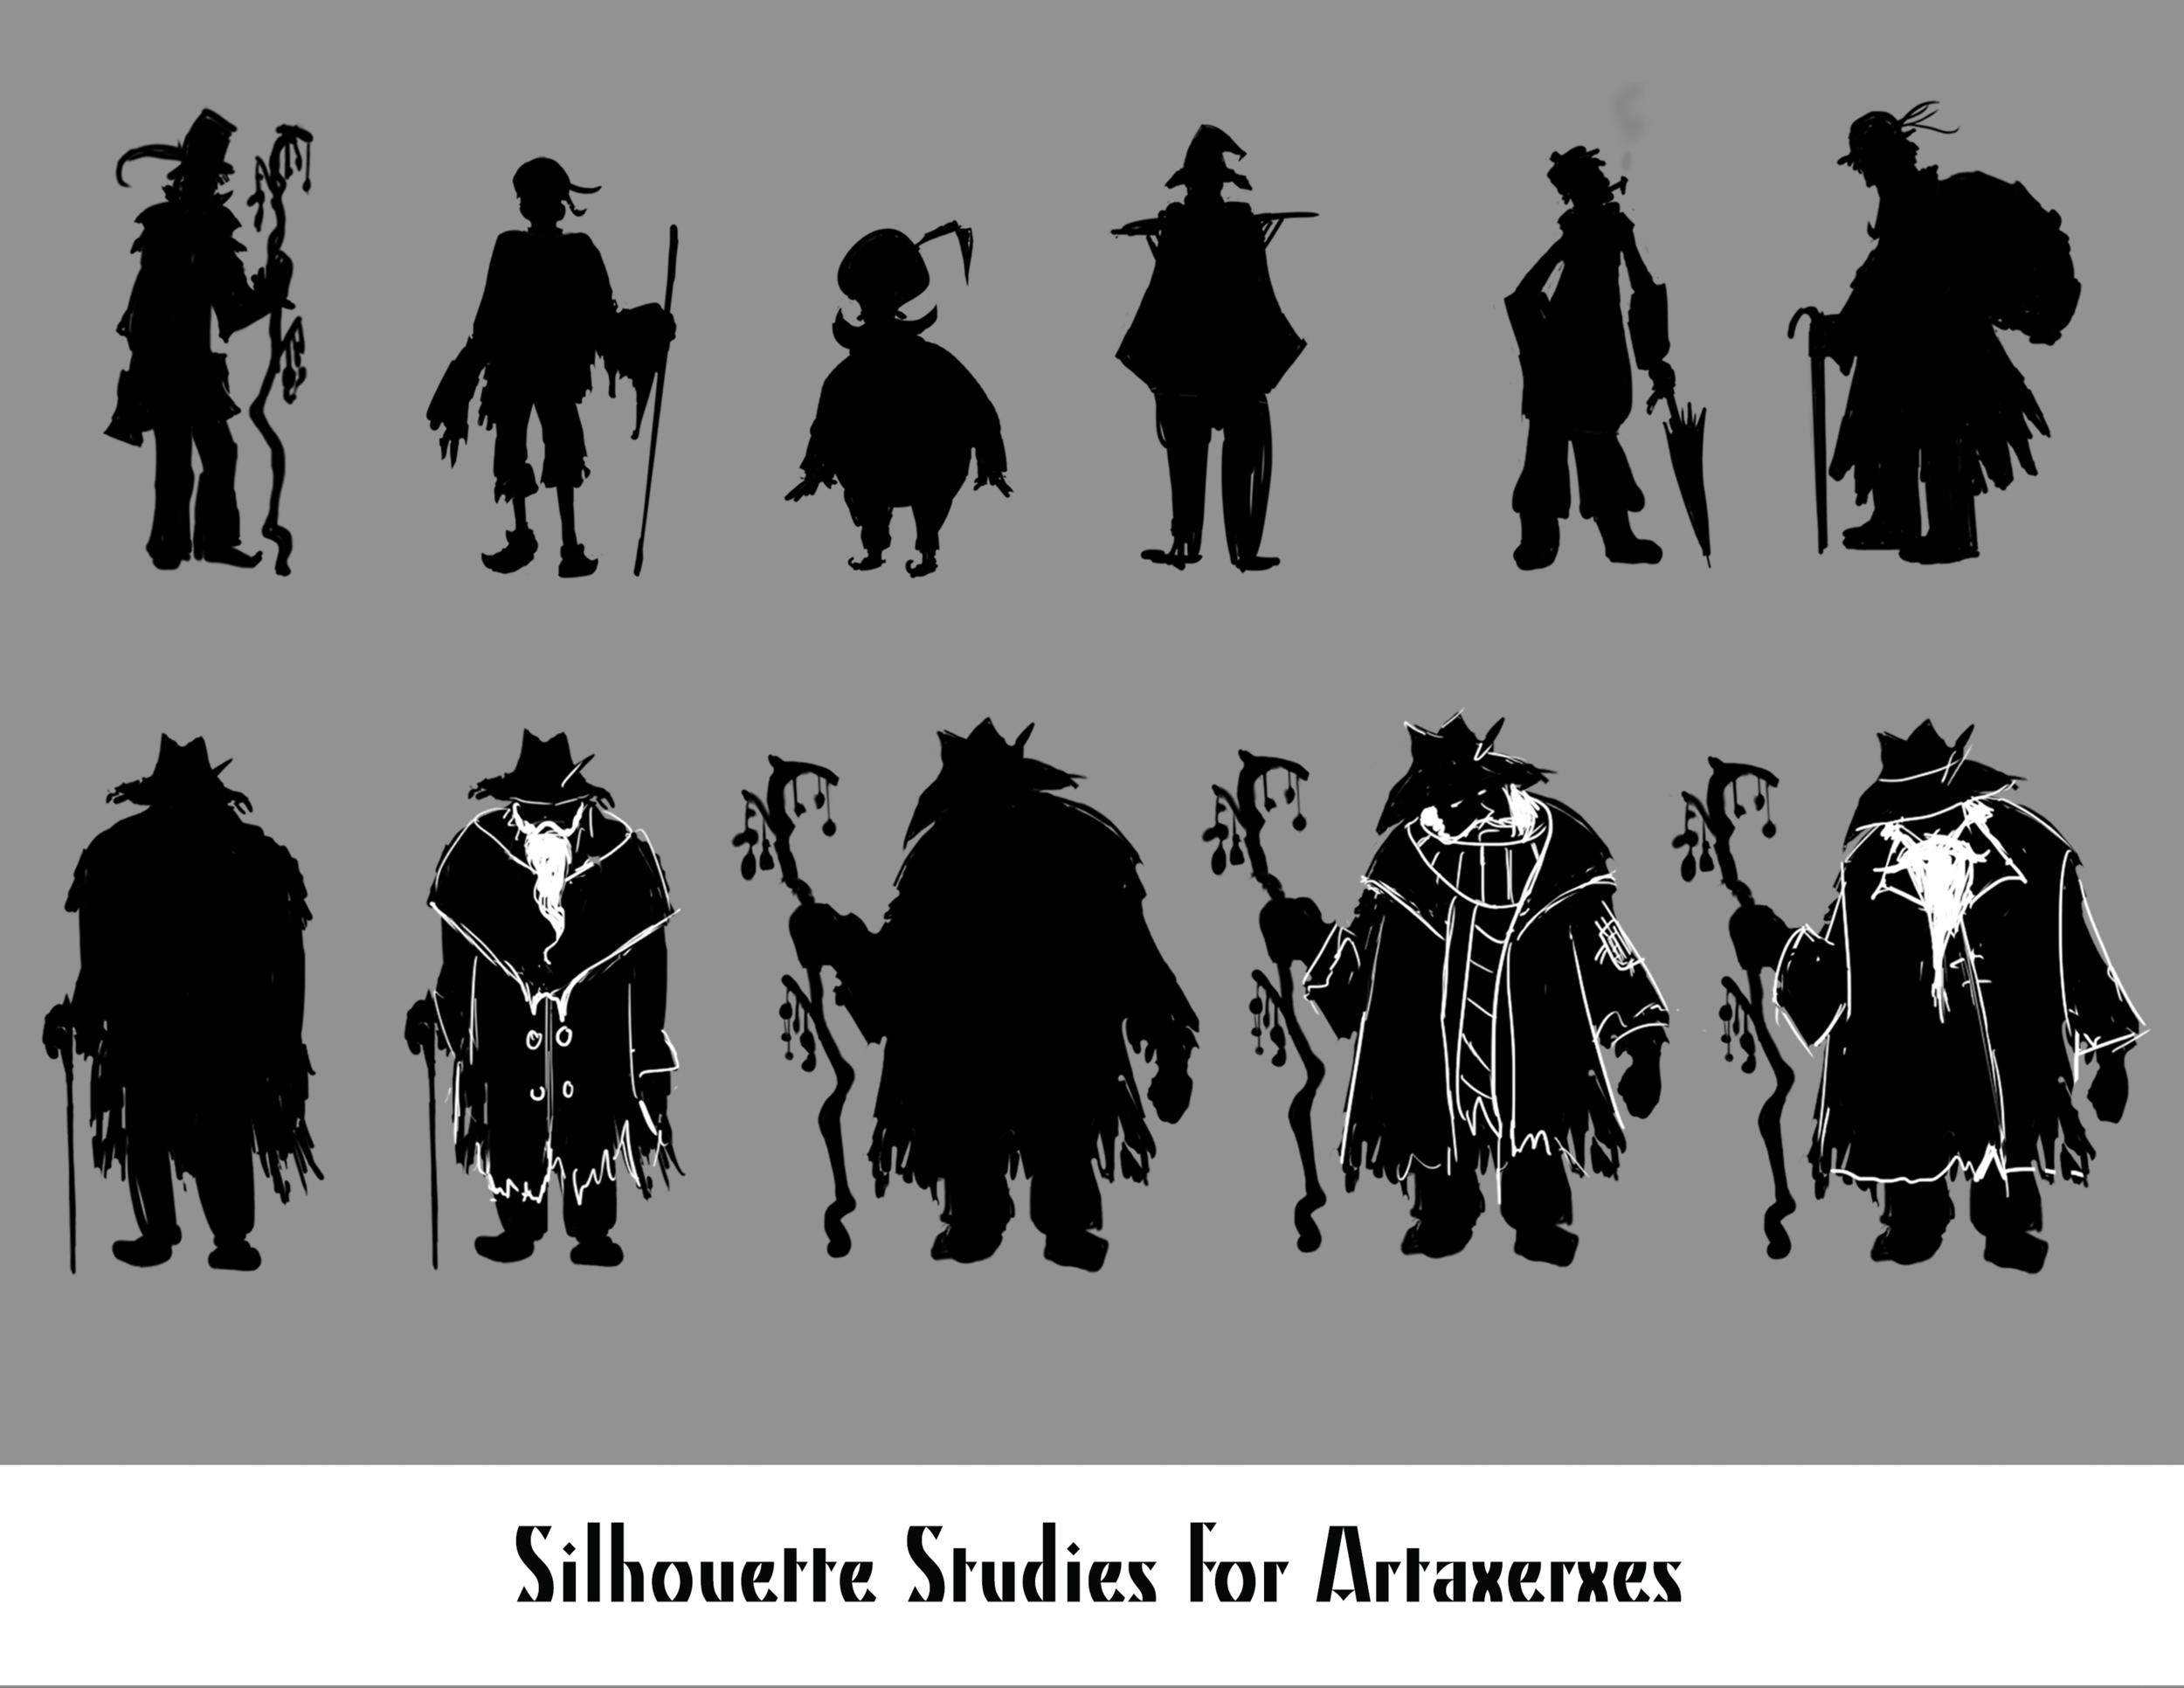 artaxerxes silhouettes.png